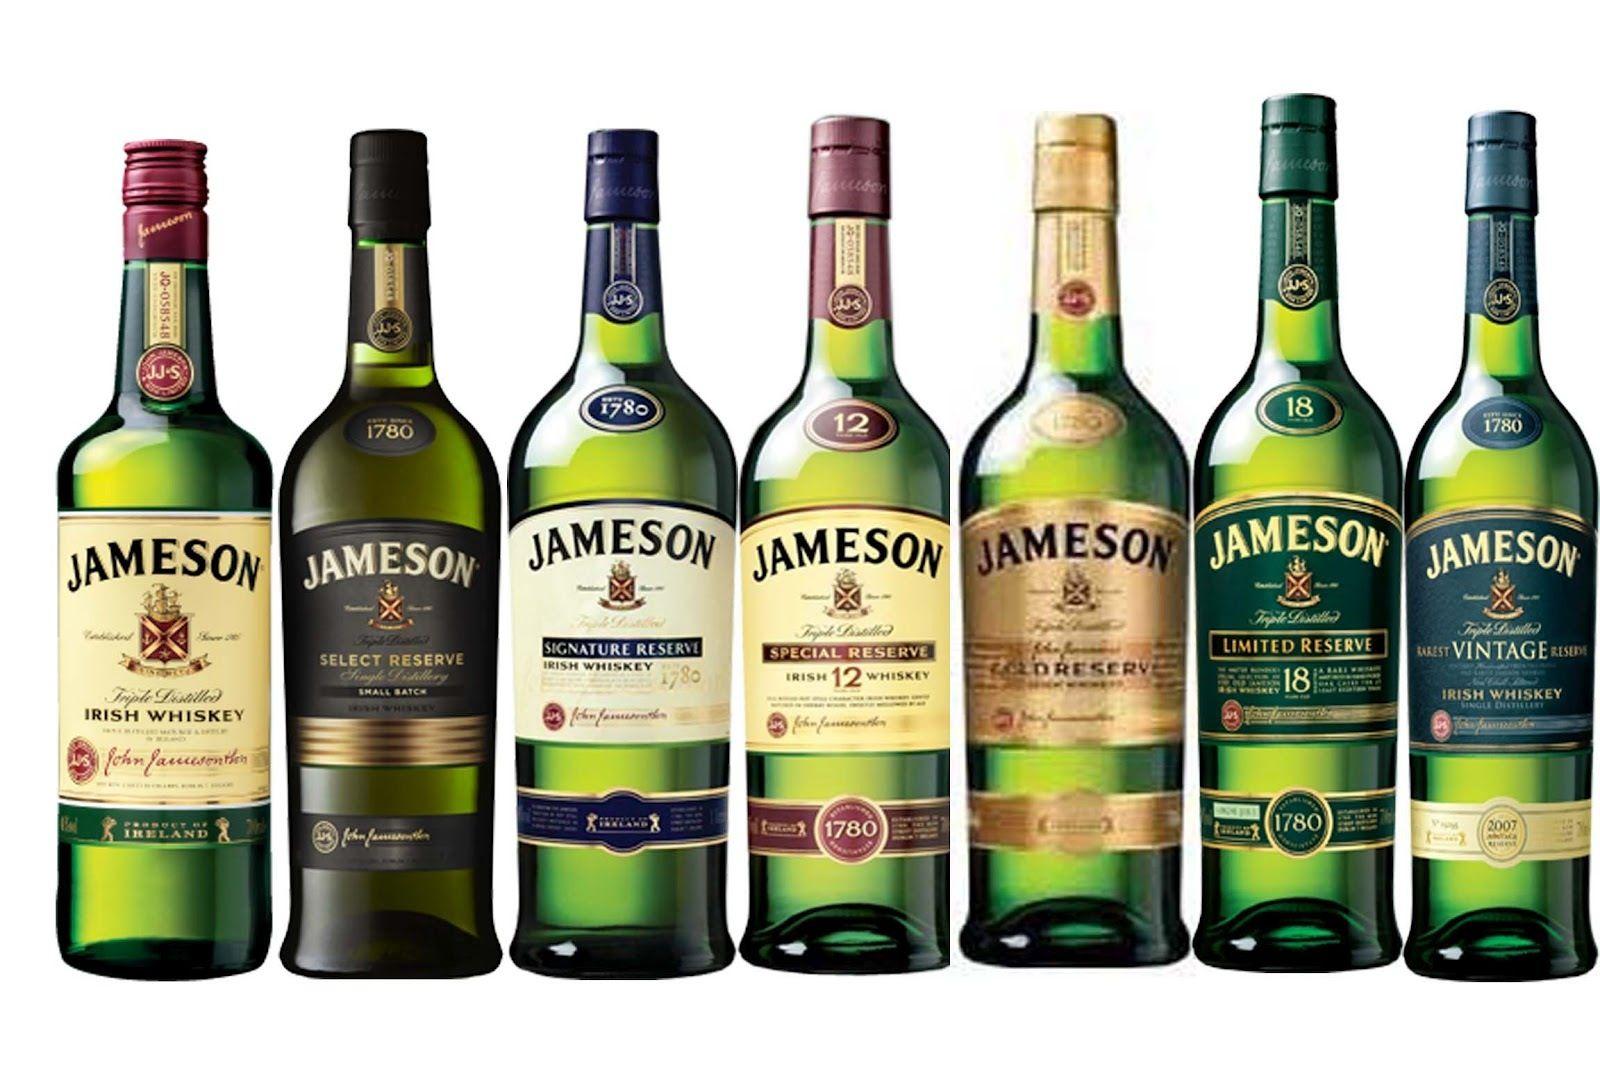 a4776ab2869c05 Please drink responsibly...designate a driver or take a cab. Always enjoy  real whiskey XD